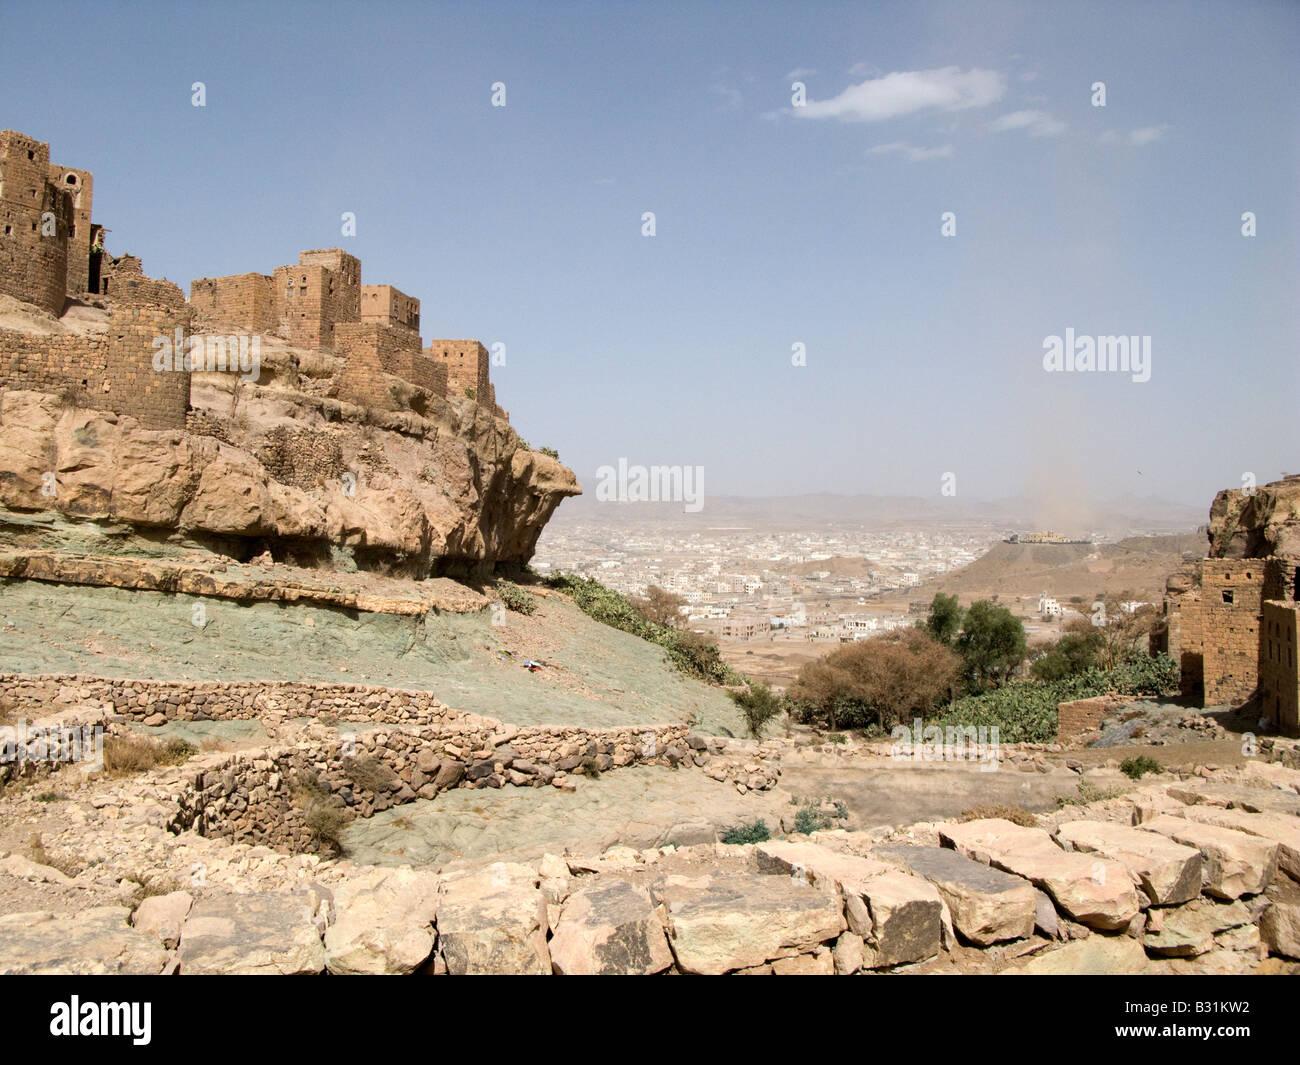 Bait Baus an old Jewish fortress village - Stock Image